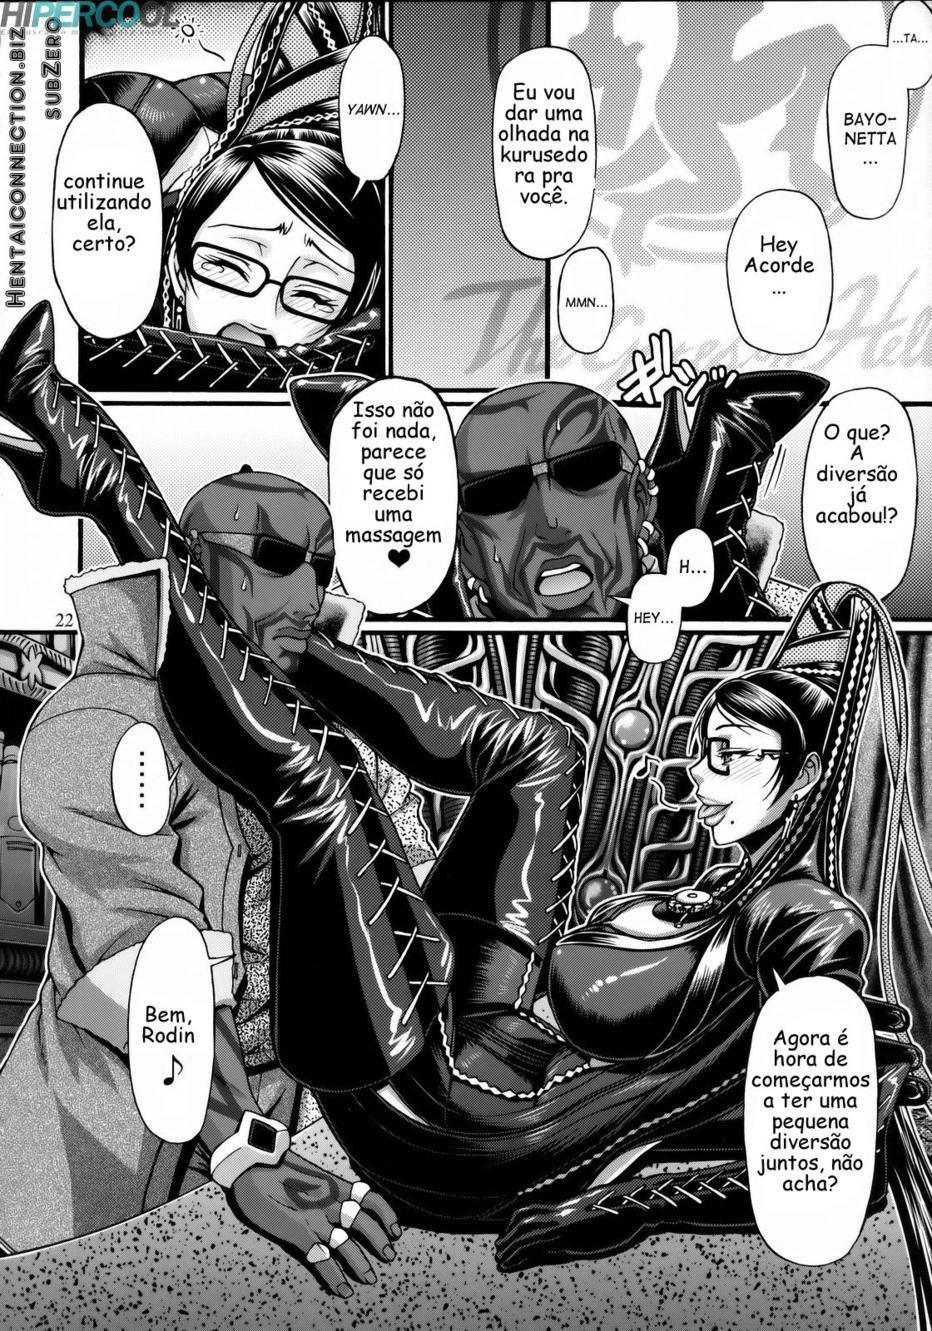 Bayonetta-hentai-Home-20